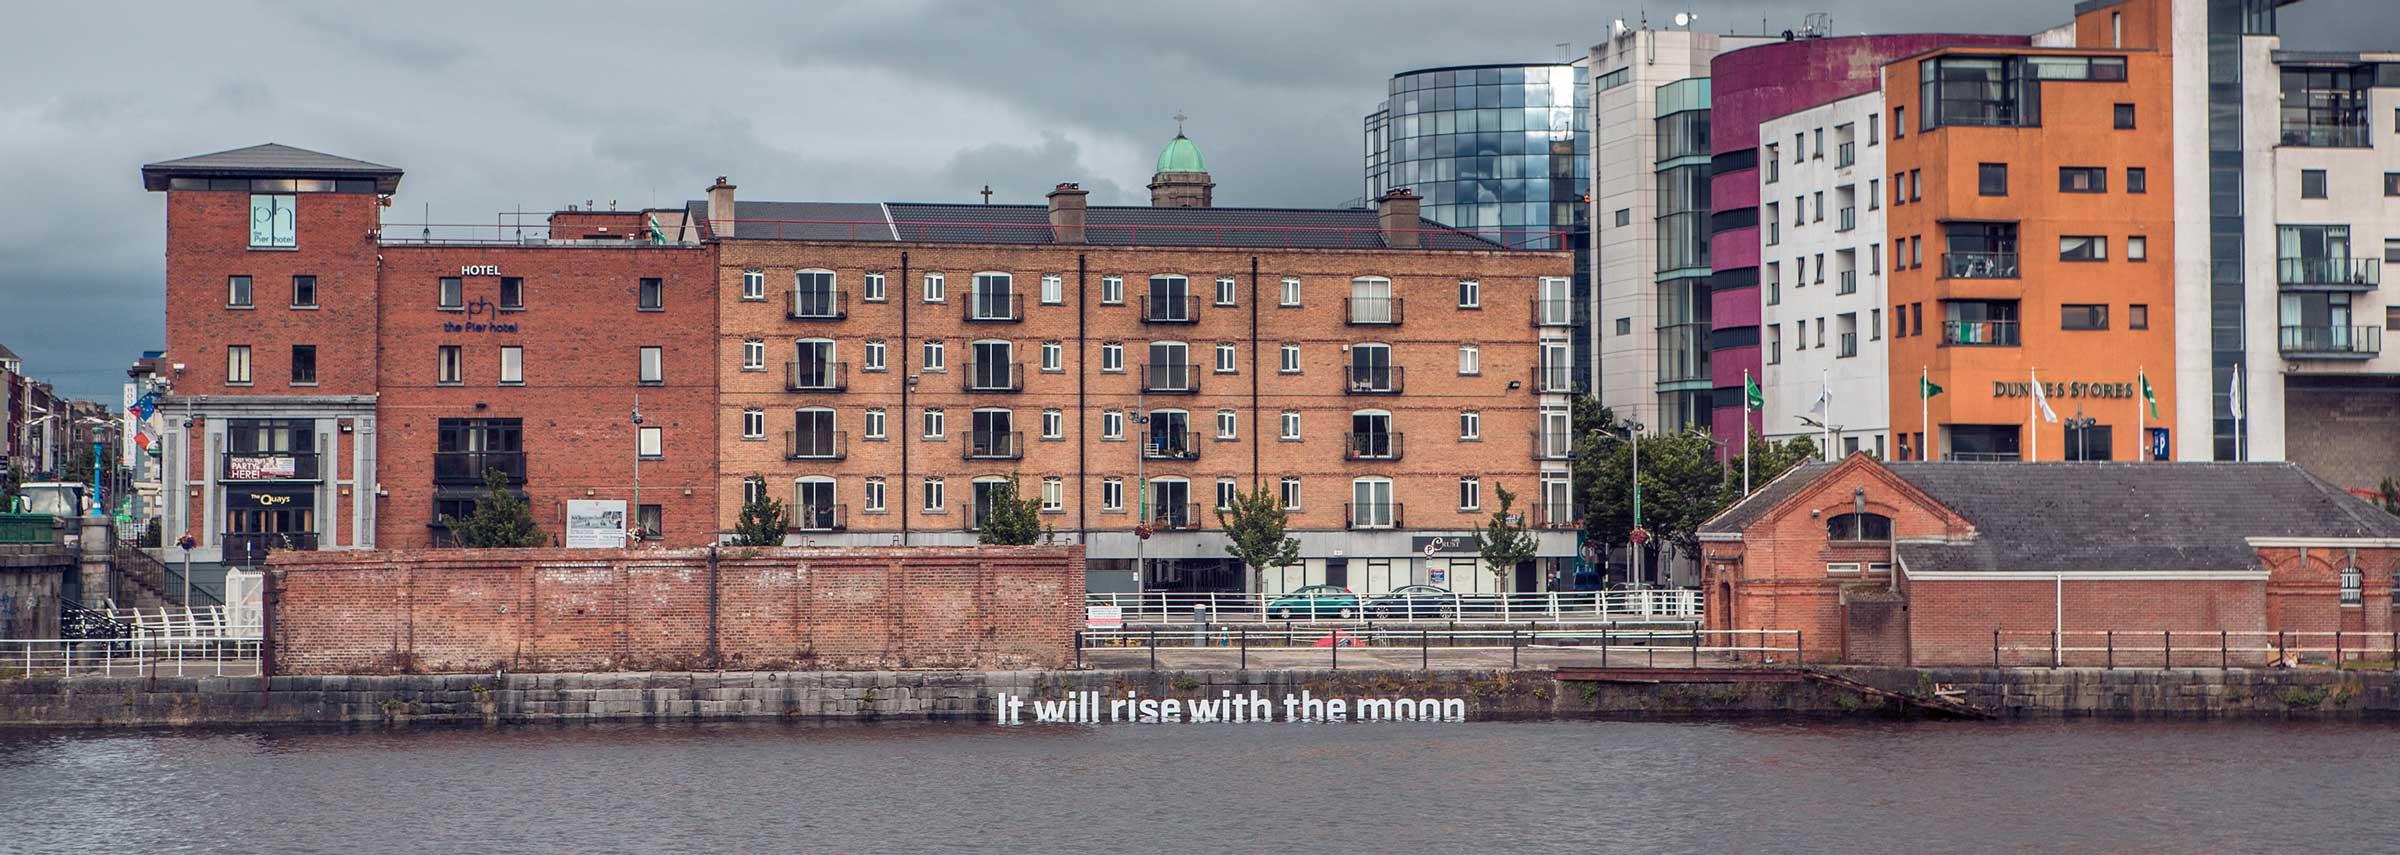 Stanzas Limerick 2020 Spatial Design